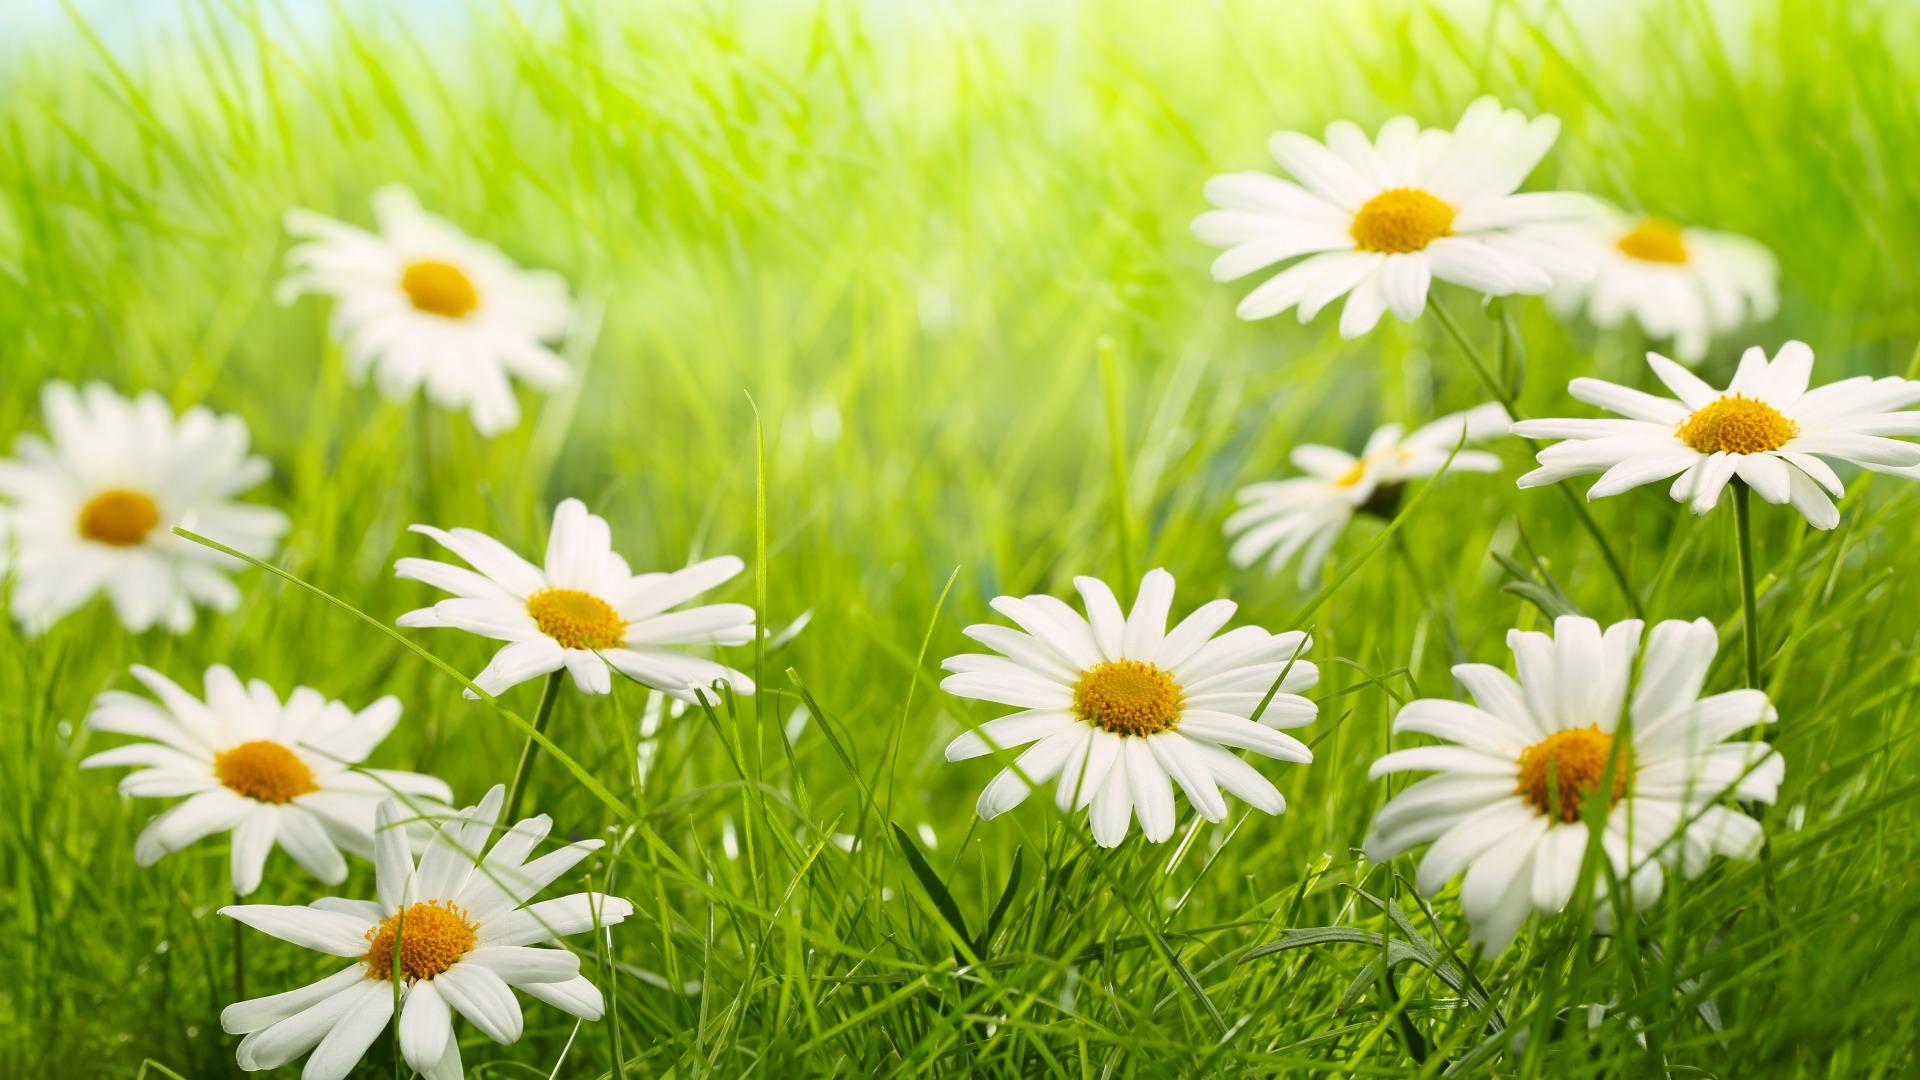 Beautiful spring wallpaper for desktop wallpapersafari - Backgrounds springtime ...